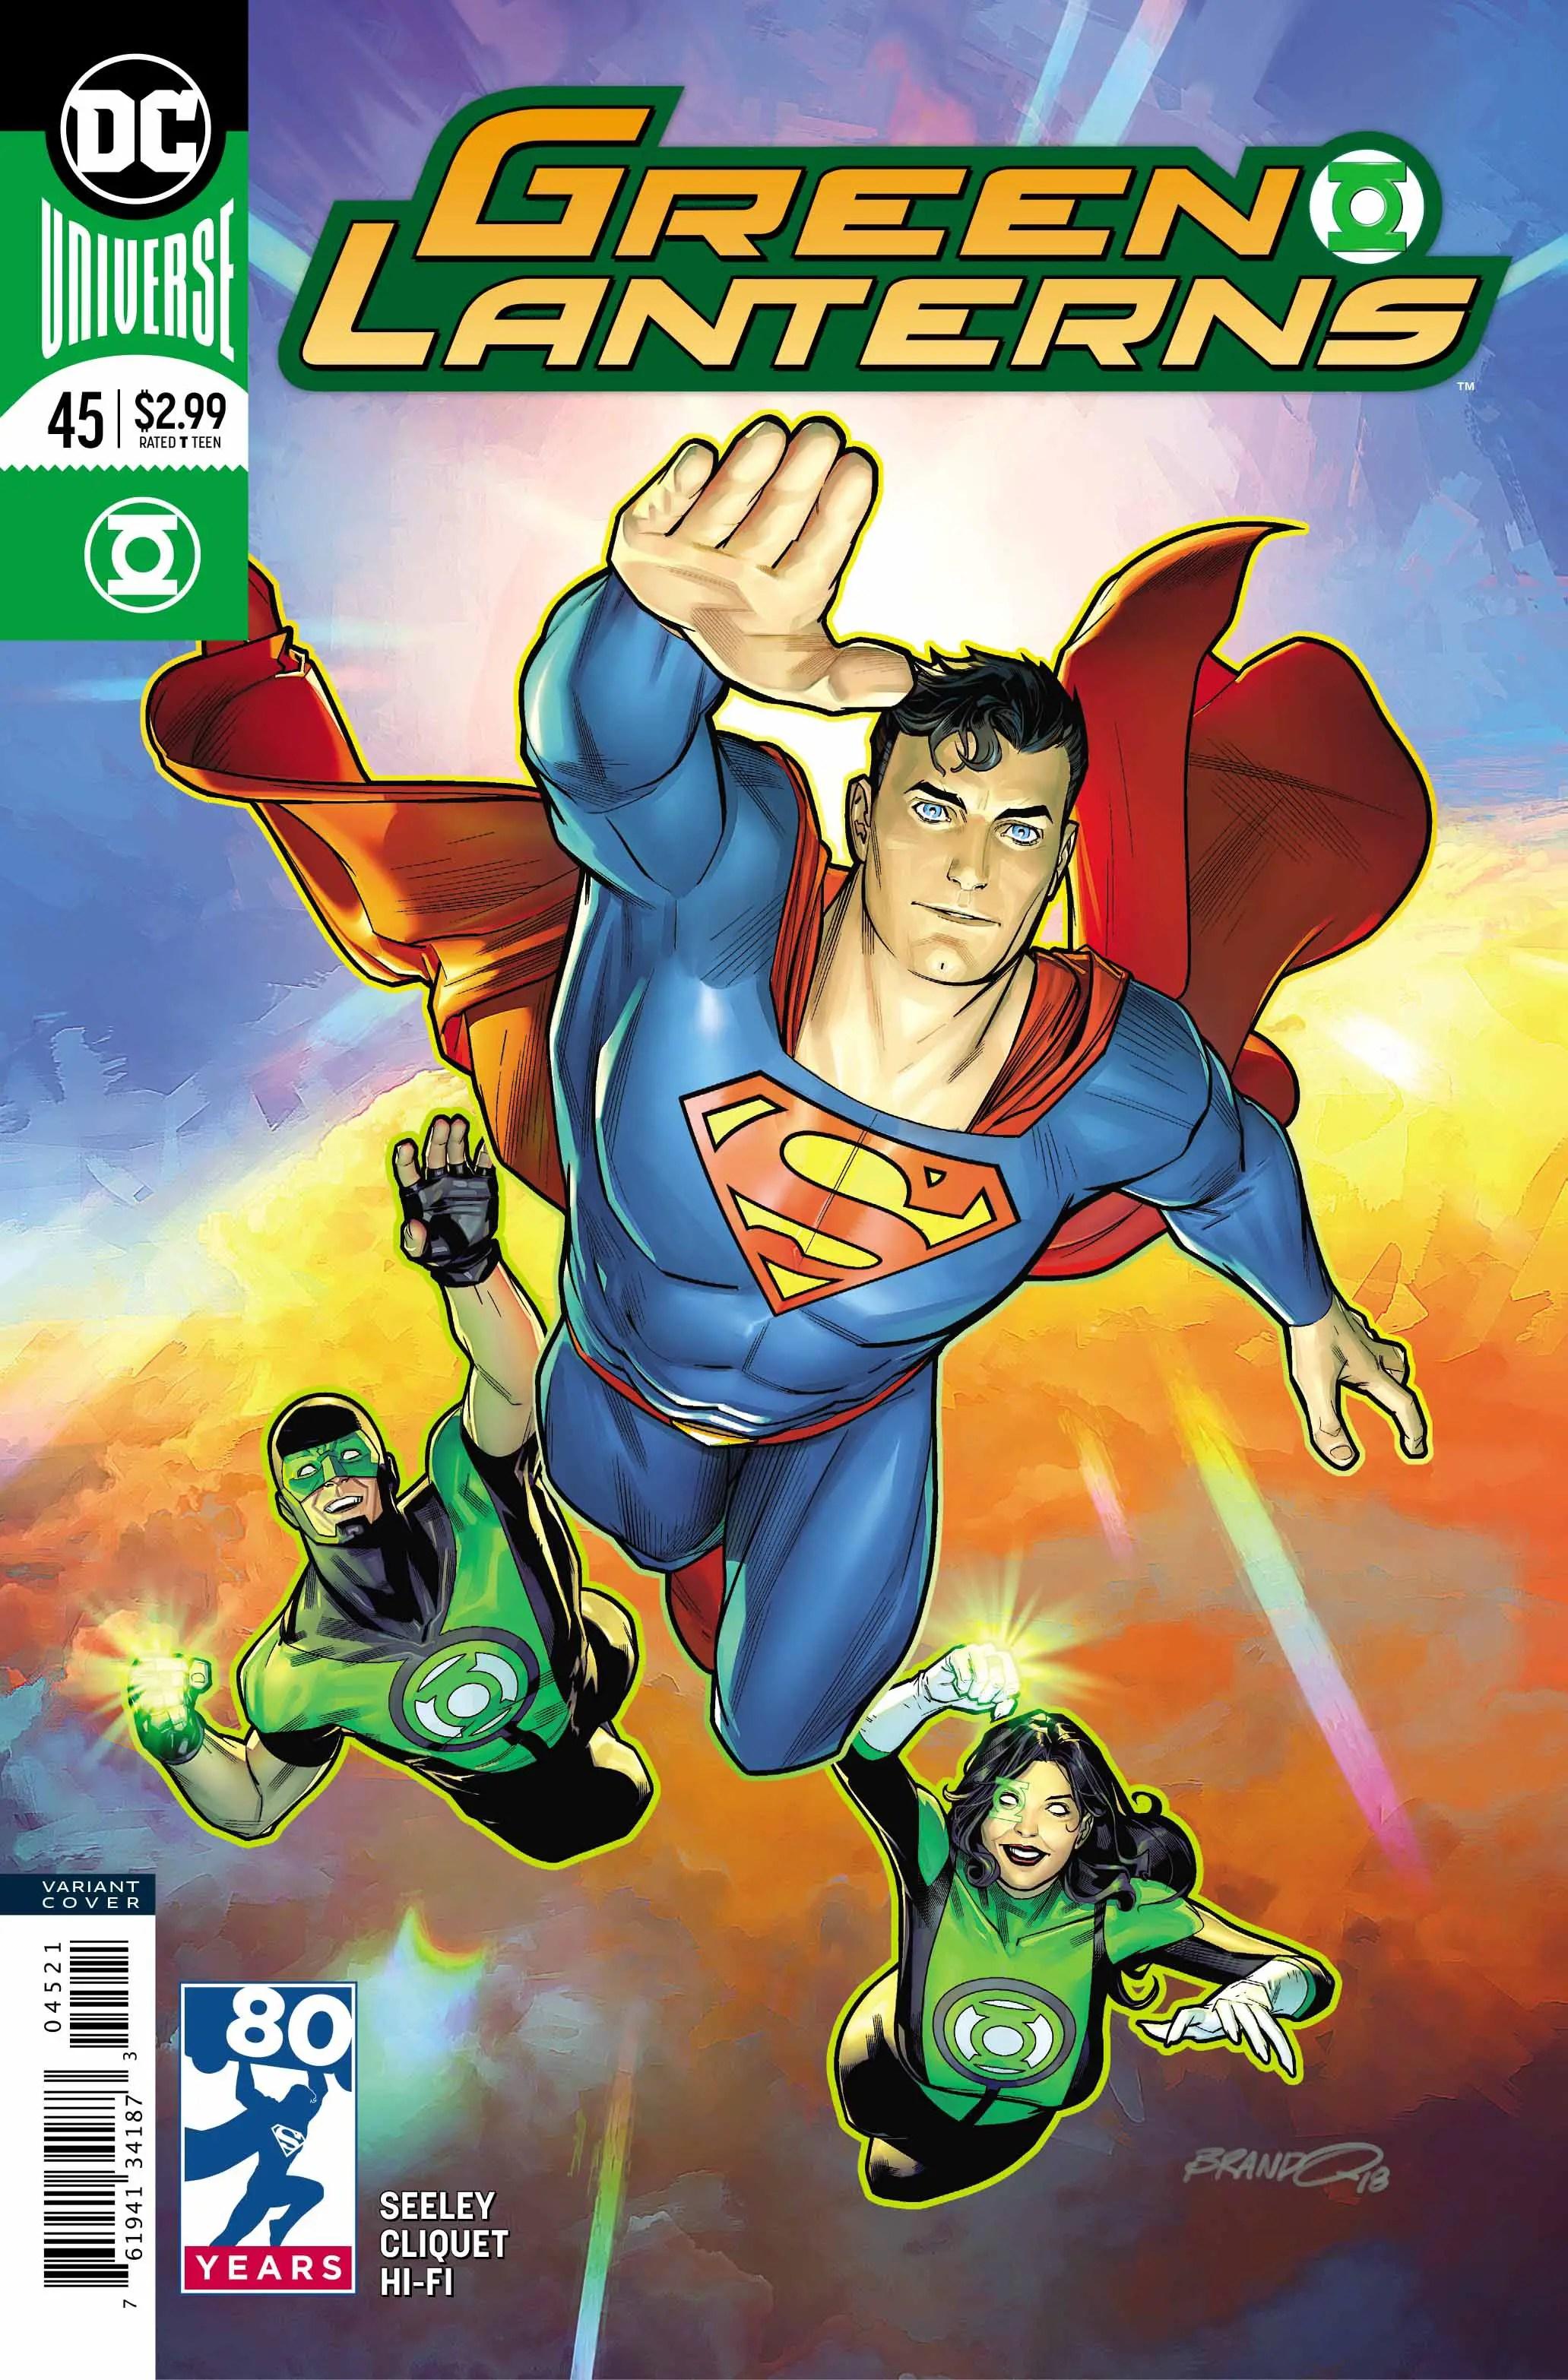 Green Lanterns #45 review: Adding depth to both villain and hero